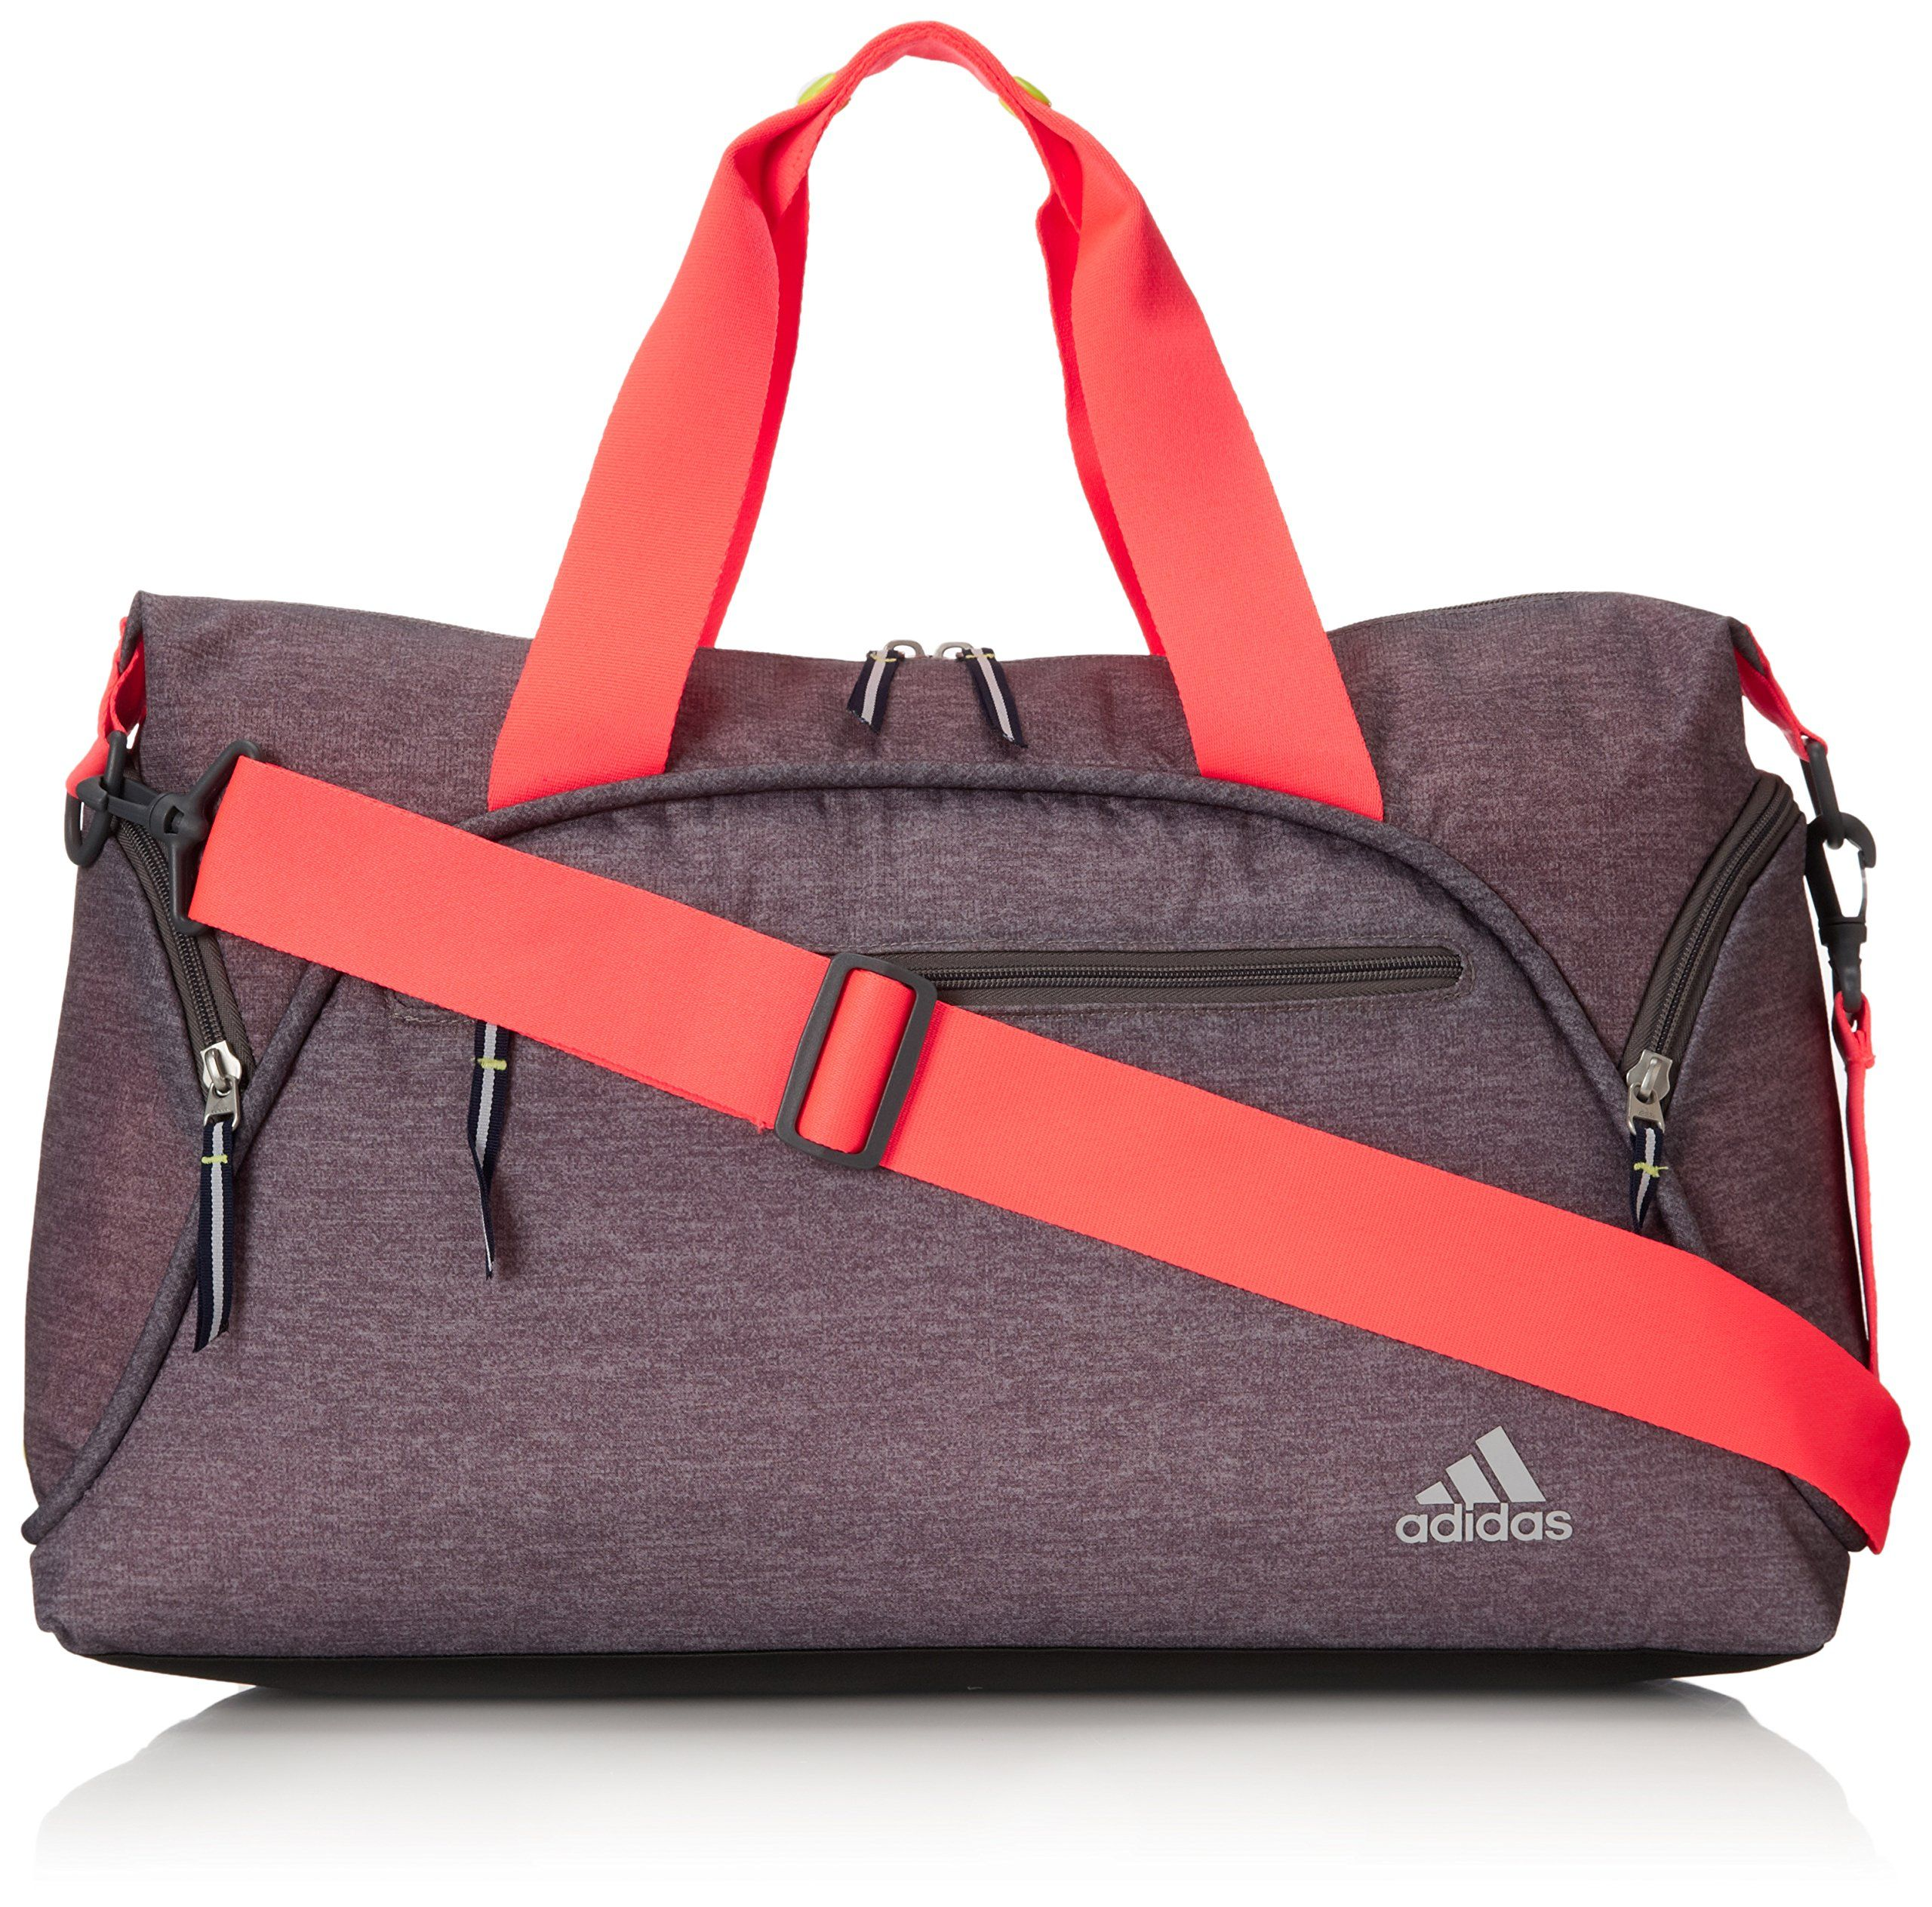 3b7e162eec01 adidas Women s Fearless Club Bag